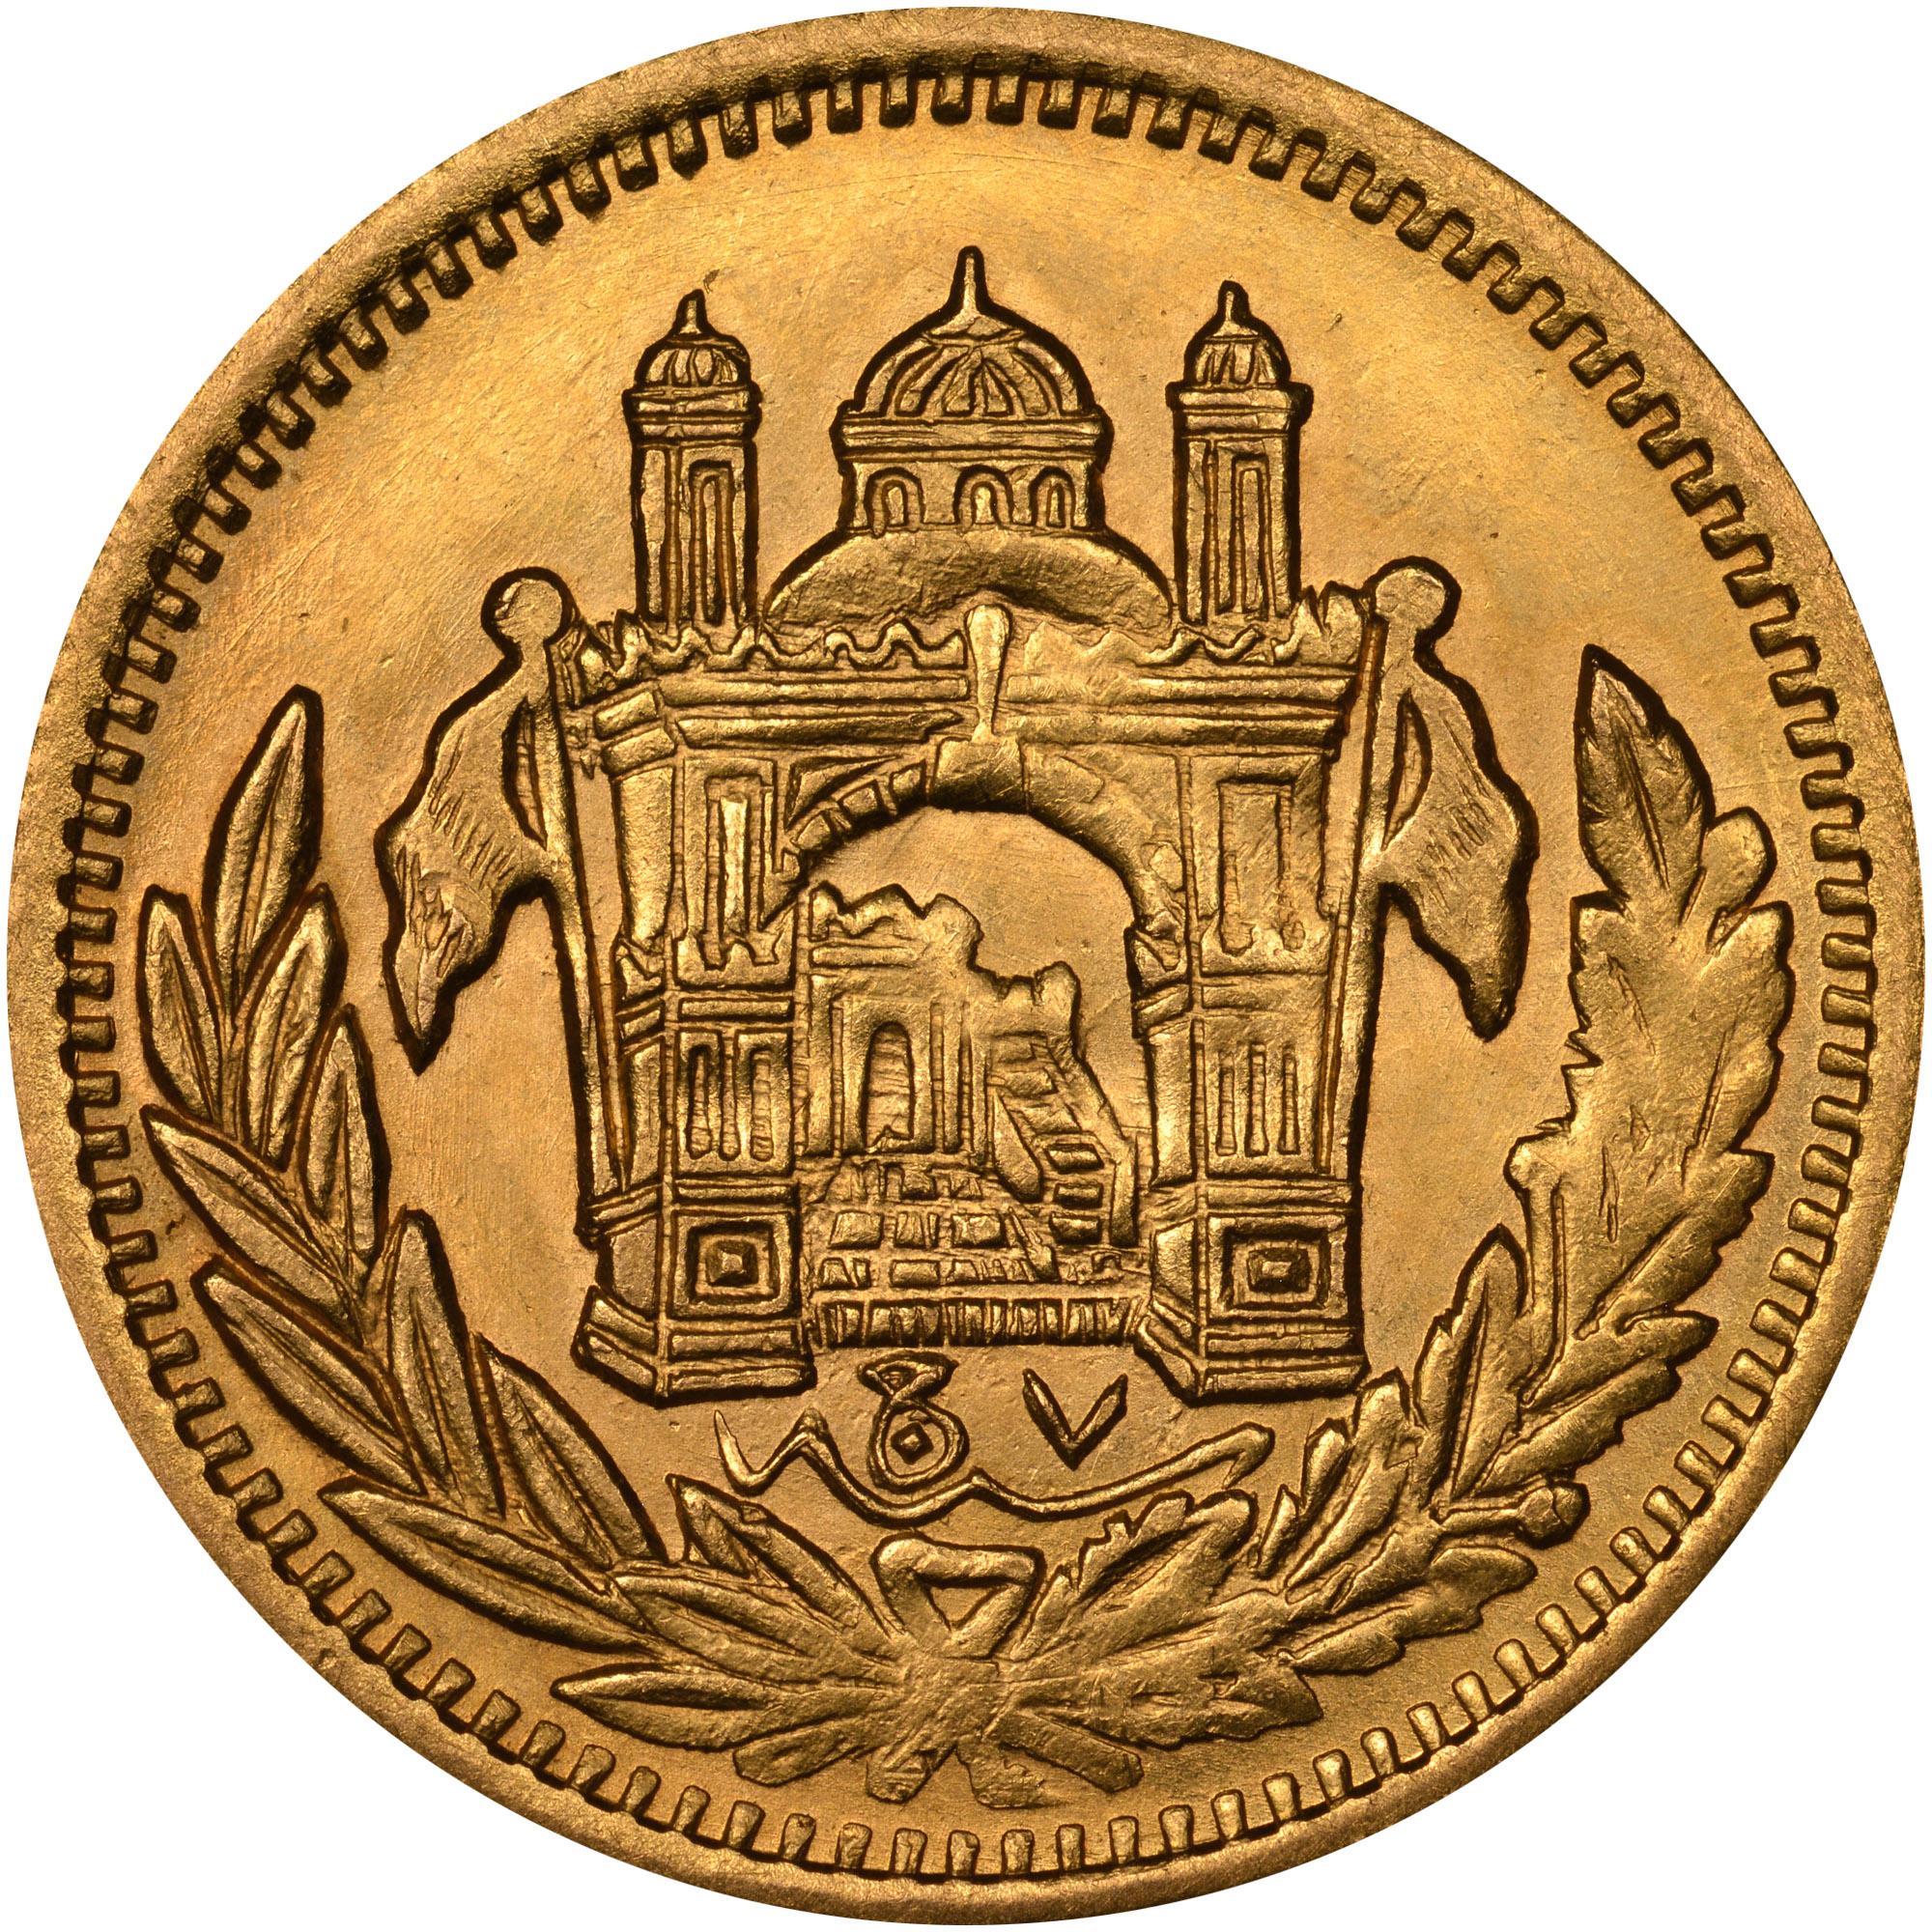 1304/7 (1925)-1306/9 (1927) Afghanistan Amani reverse